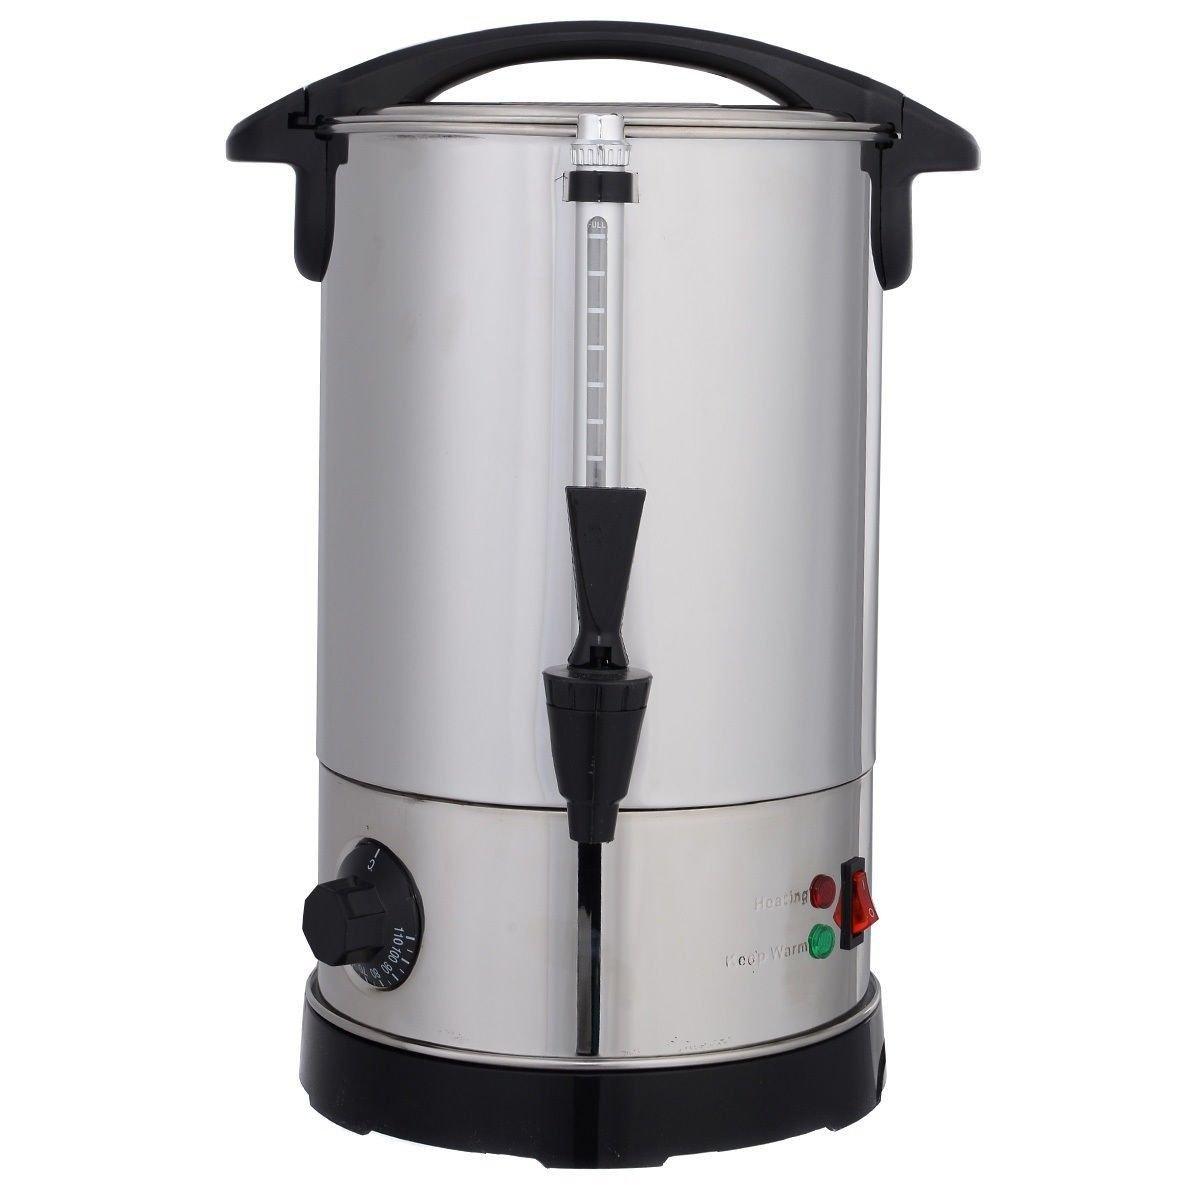 Stainless Steel 6 Quart Electric Water Boiler Warmer Hot Water Kettle Dispenser ,product_by: patsbargainhut14 it#59252455166927